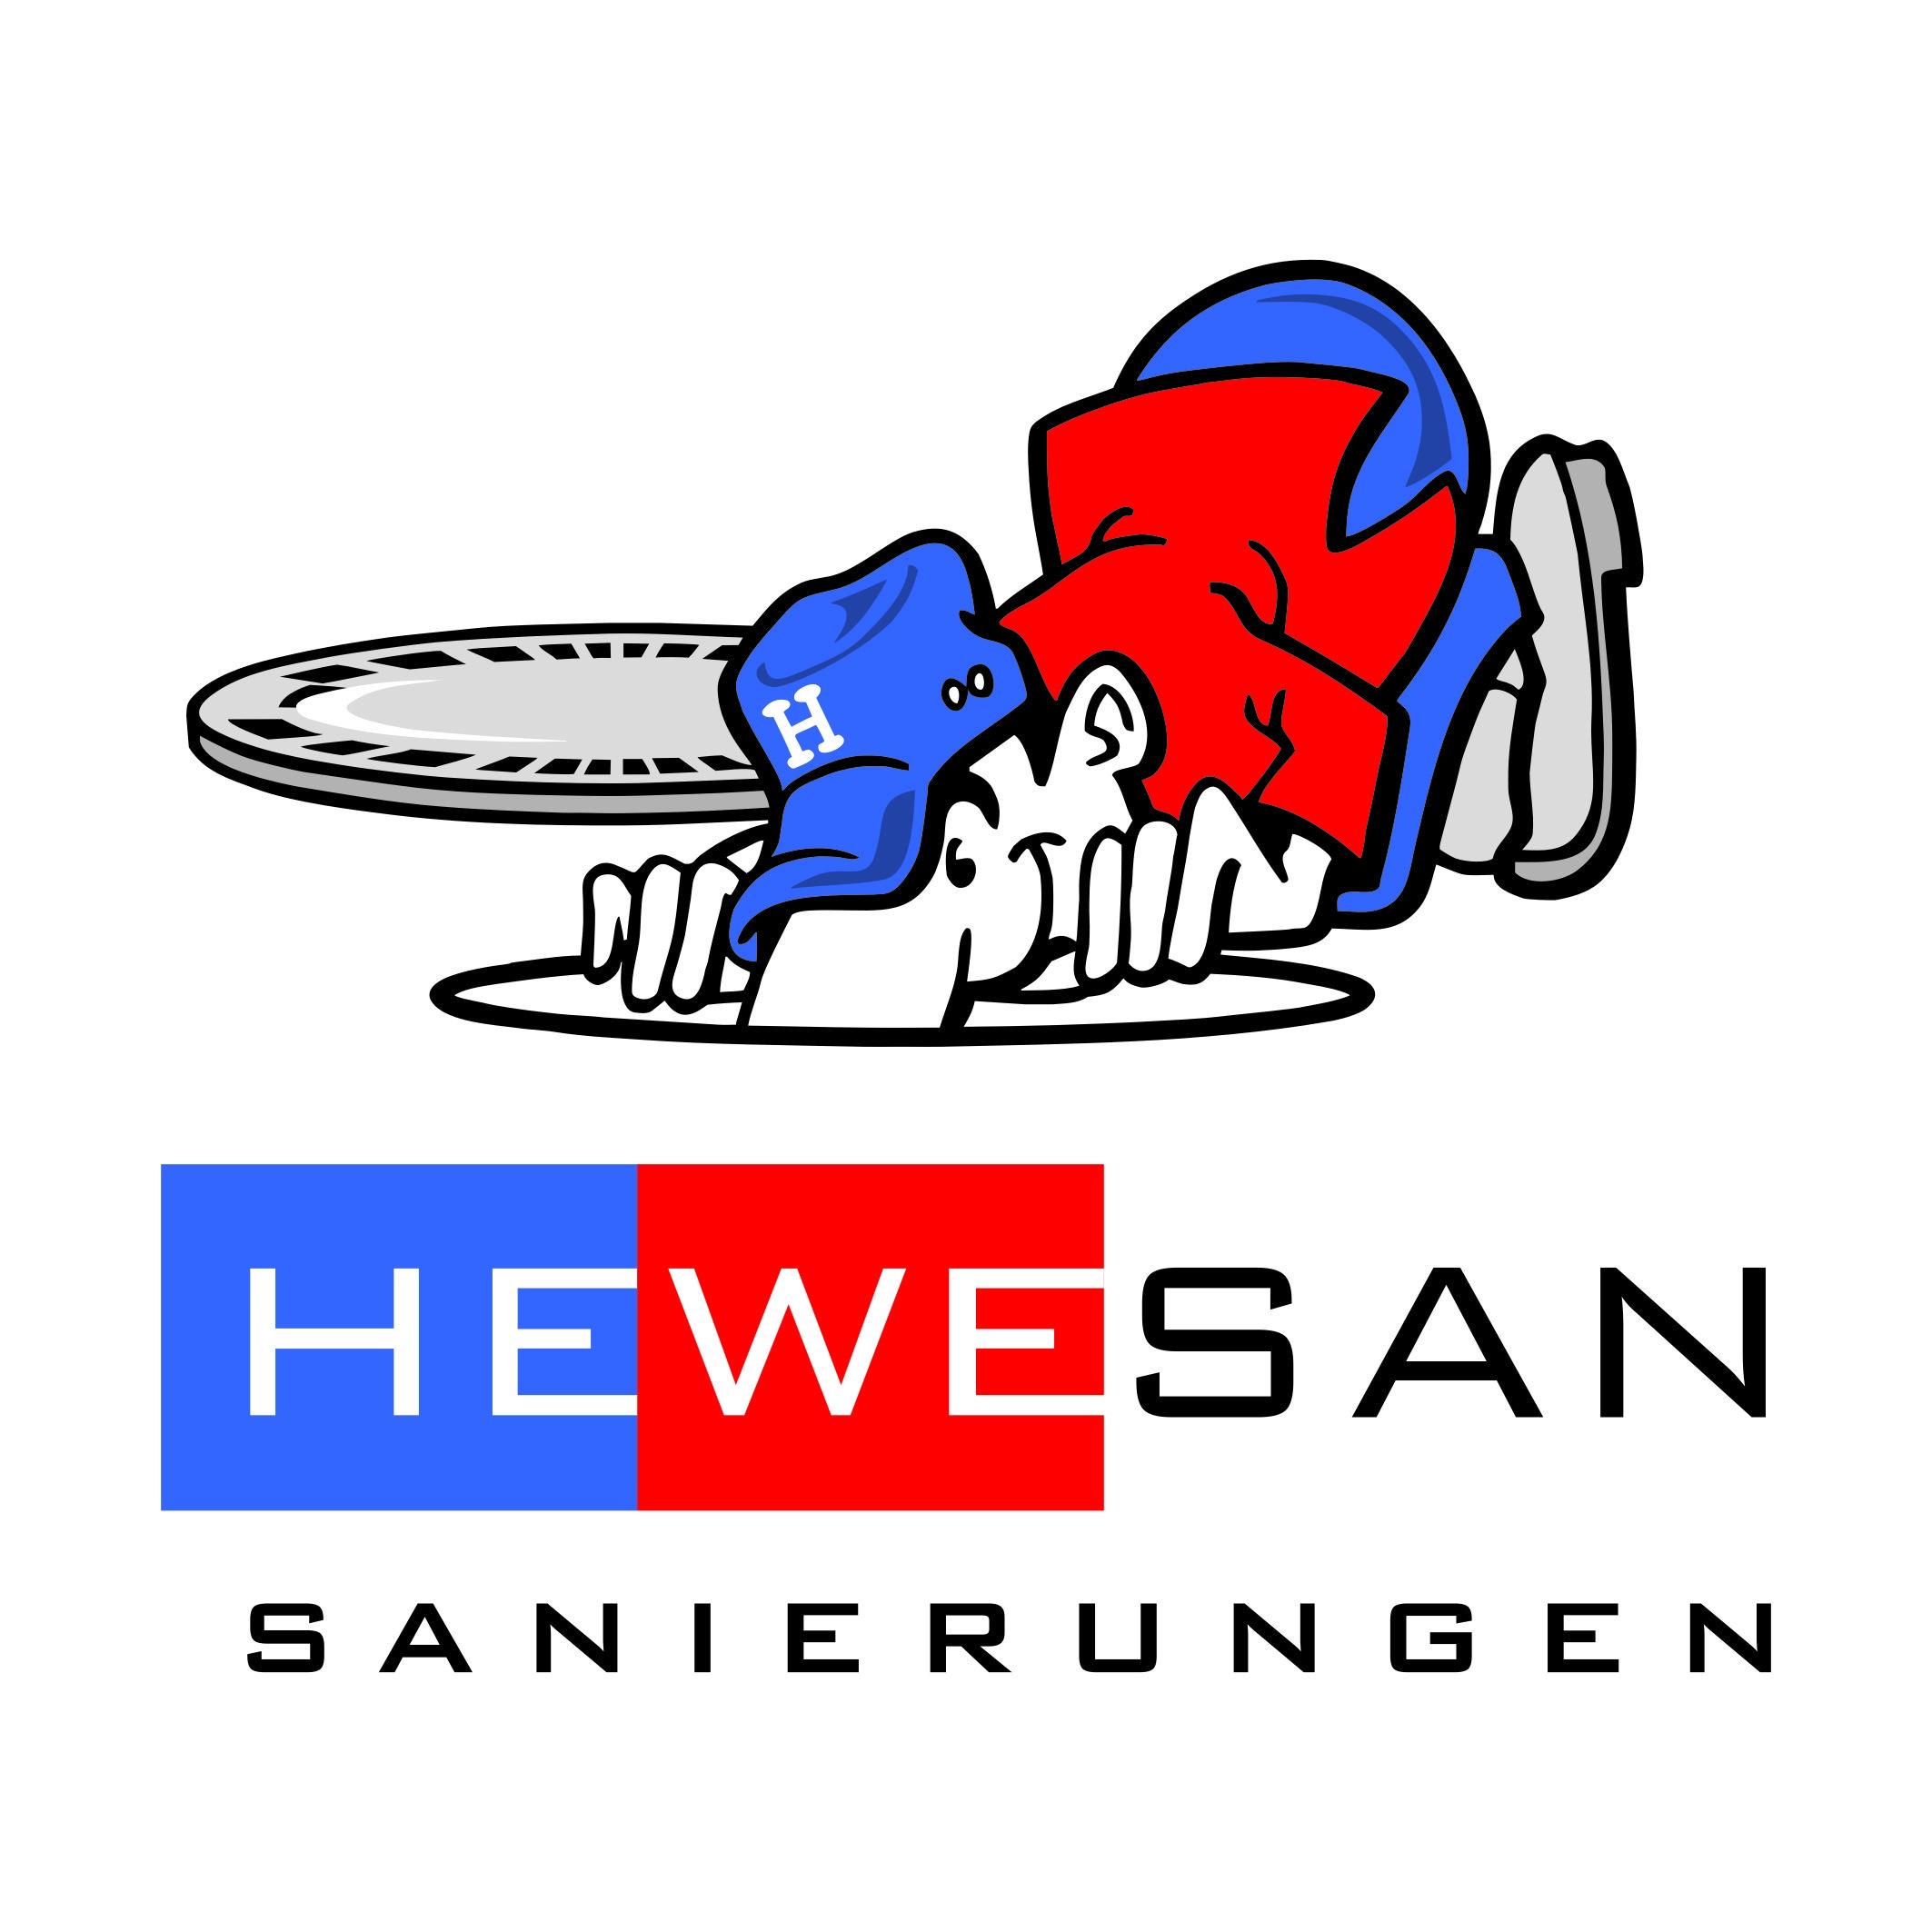 Hewesan